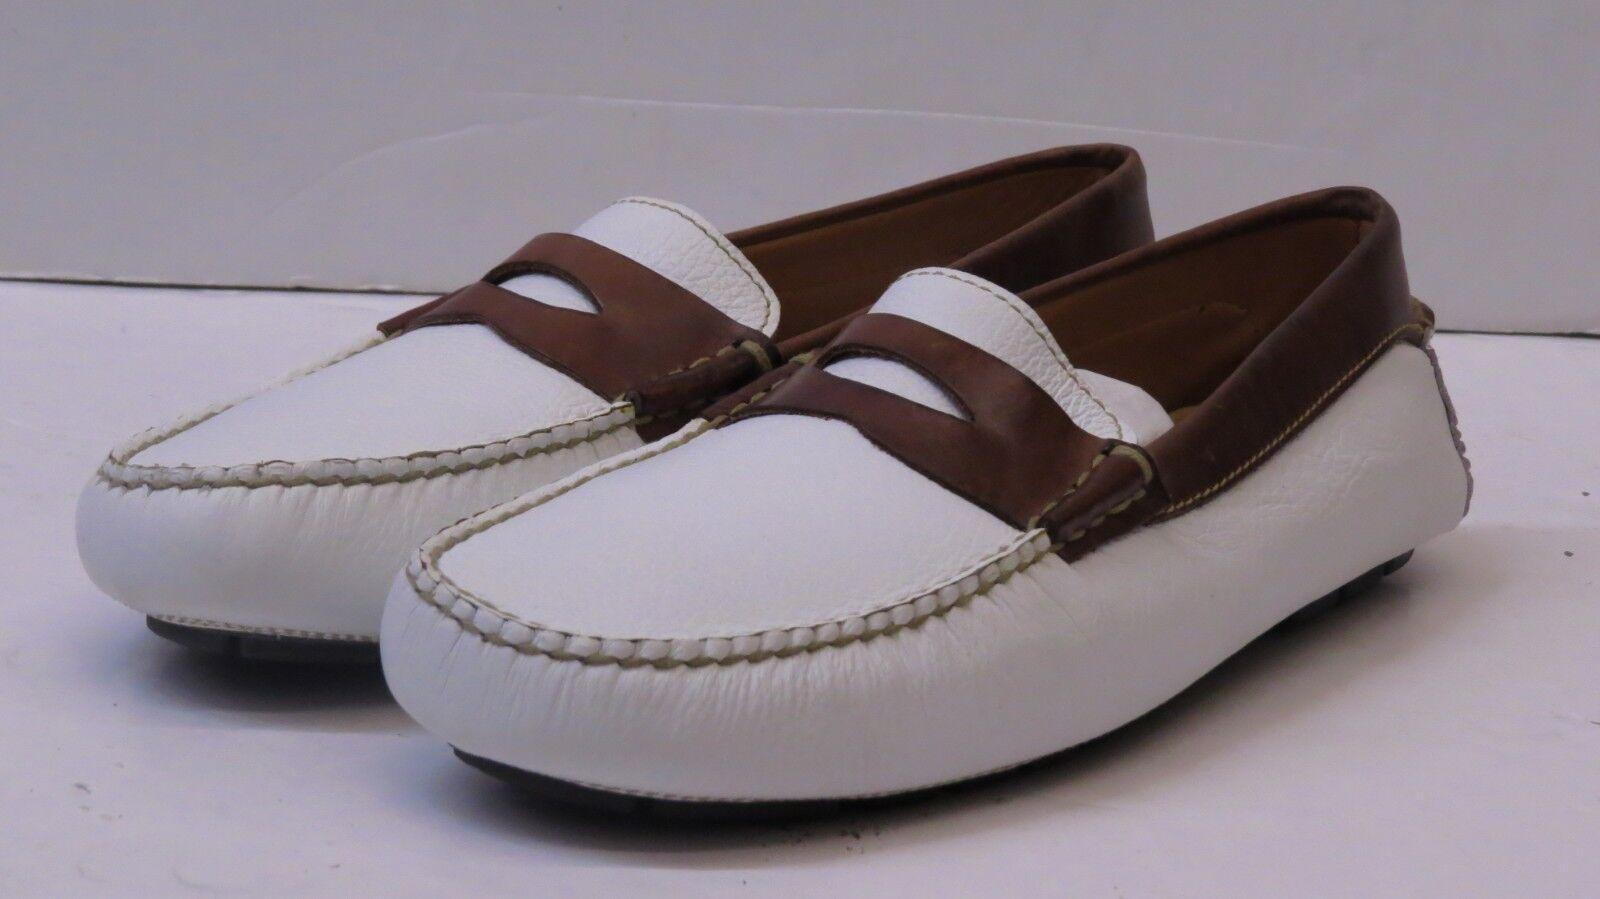 Johnson & Murphy 2006132 White Burman Penny Loafers SIZE 10M